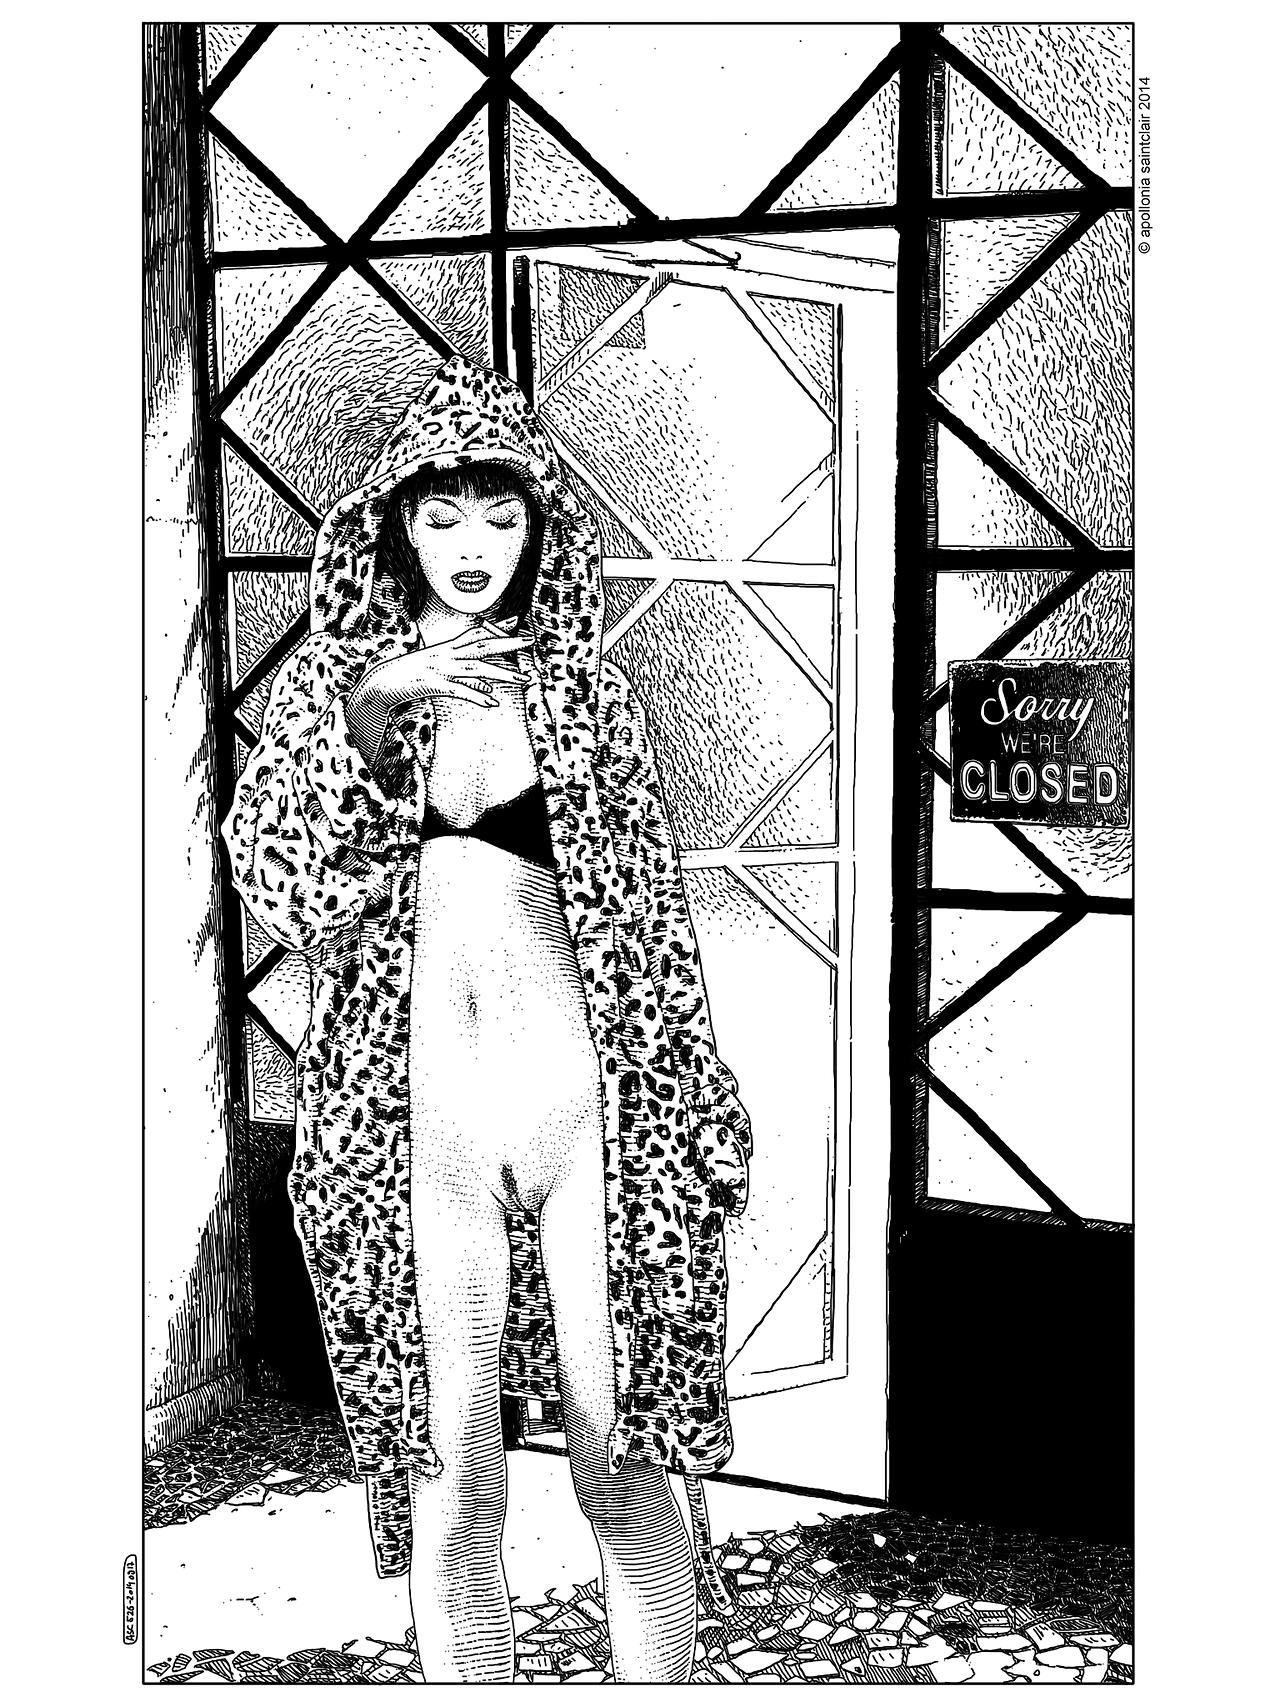 EBDLN-Apollonia-Saintclair-Erotica-3